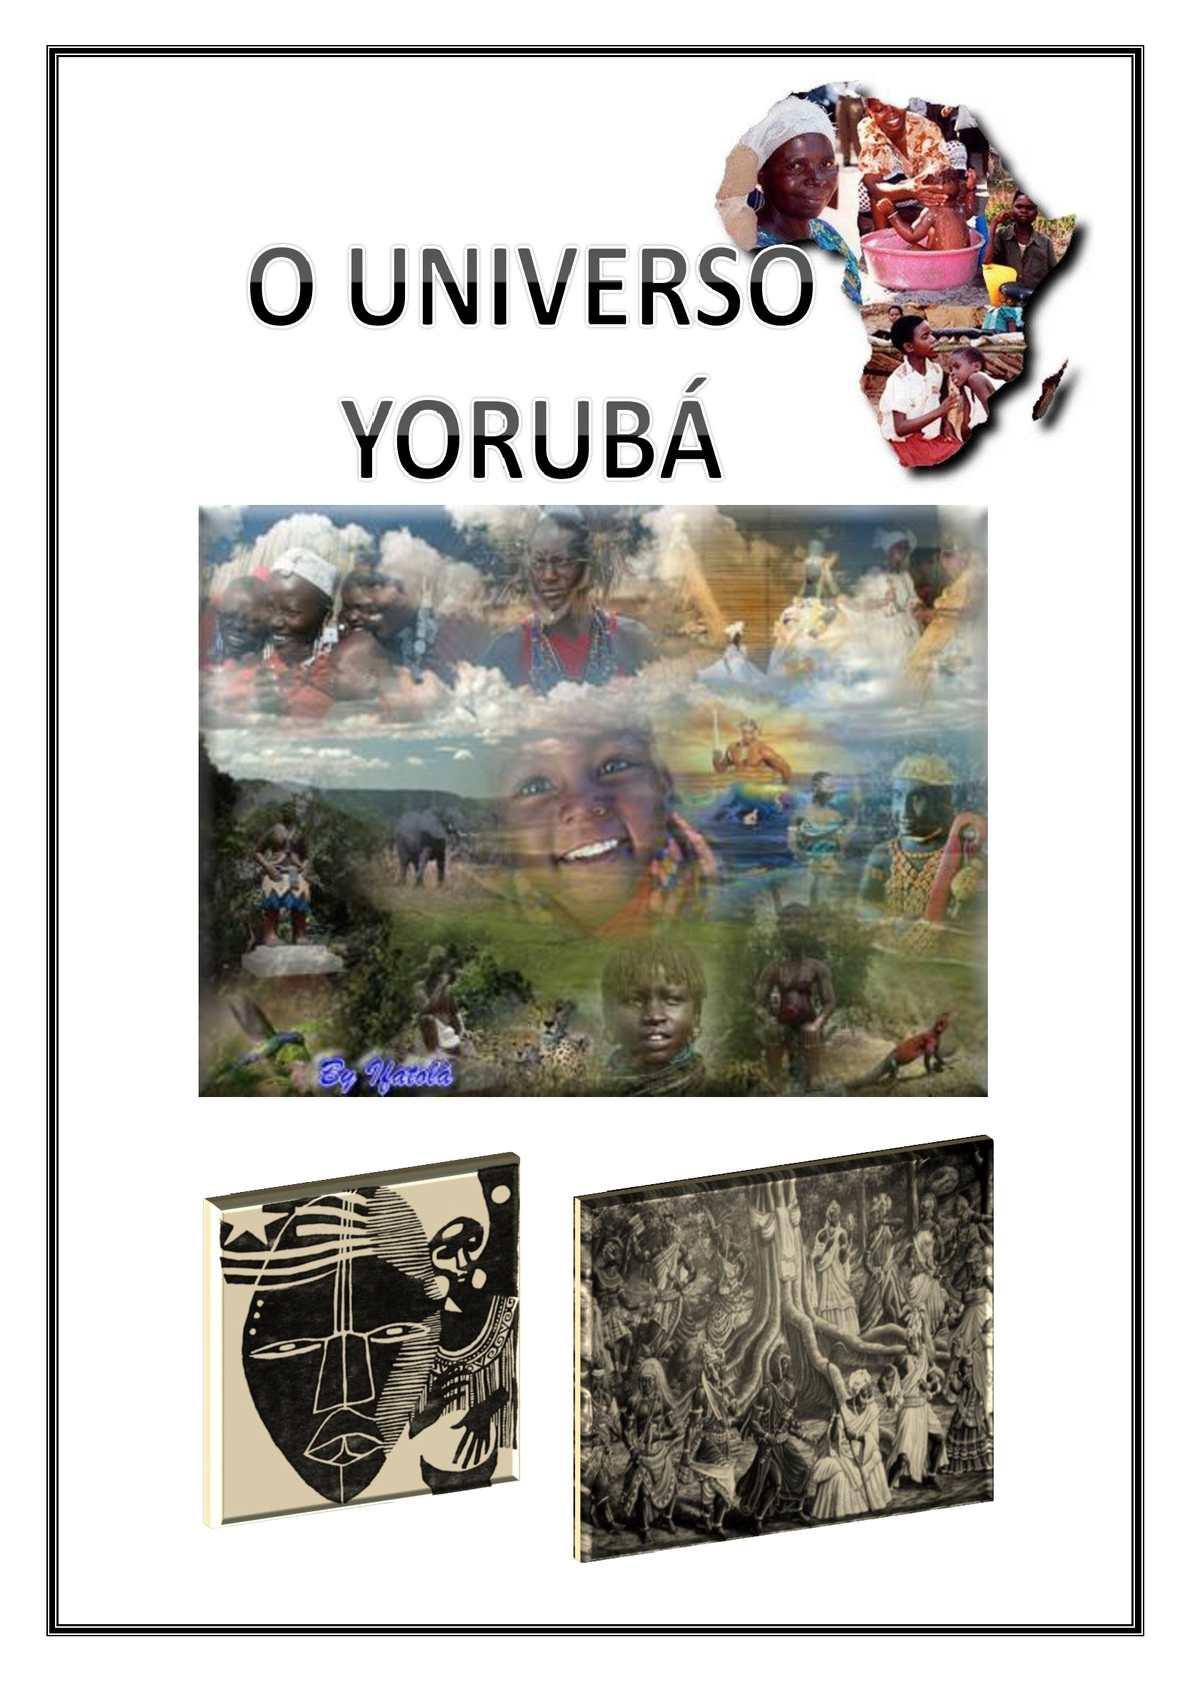 APOSTILA - O Universo Yoruba